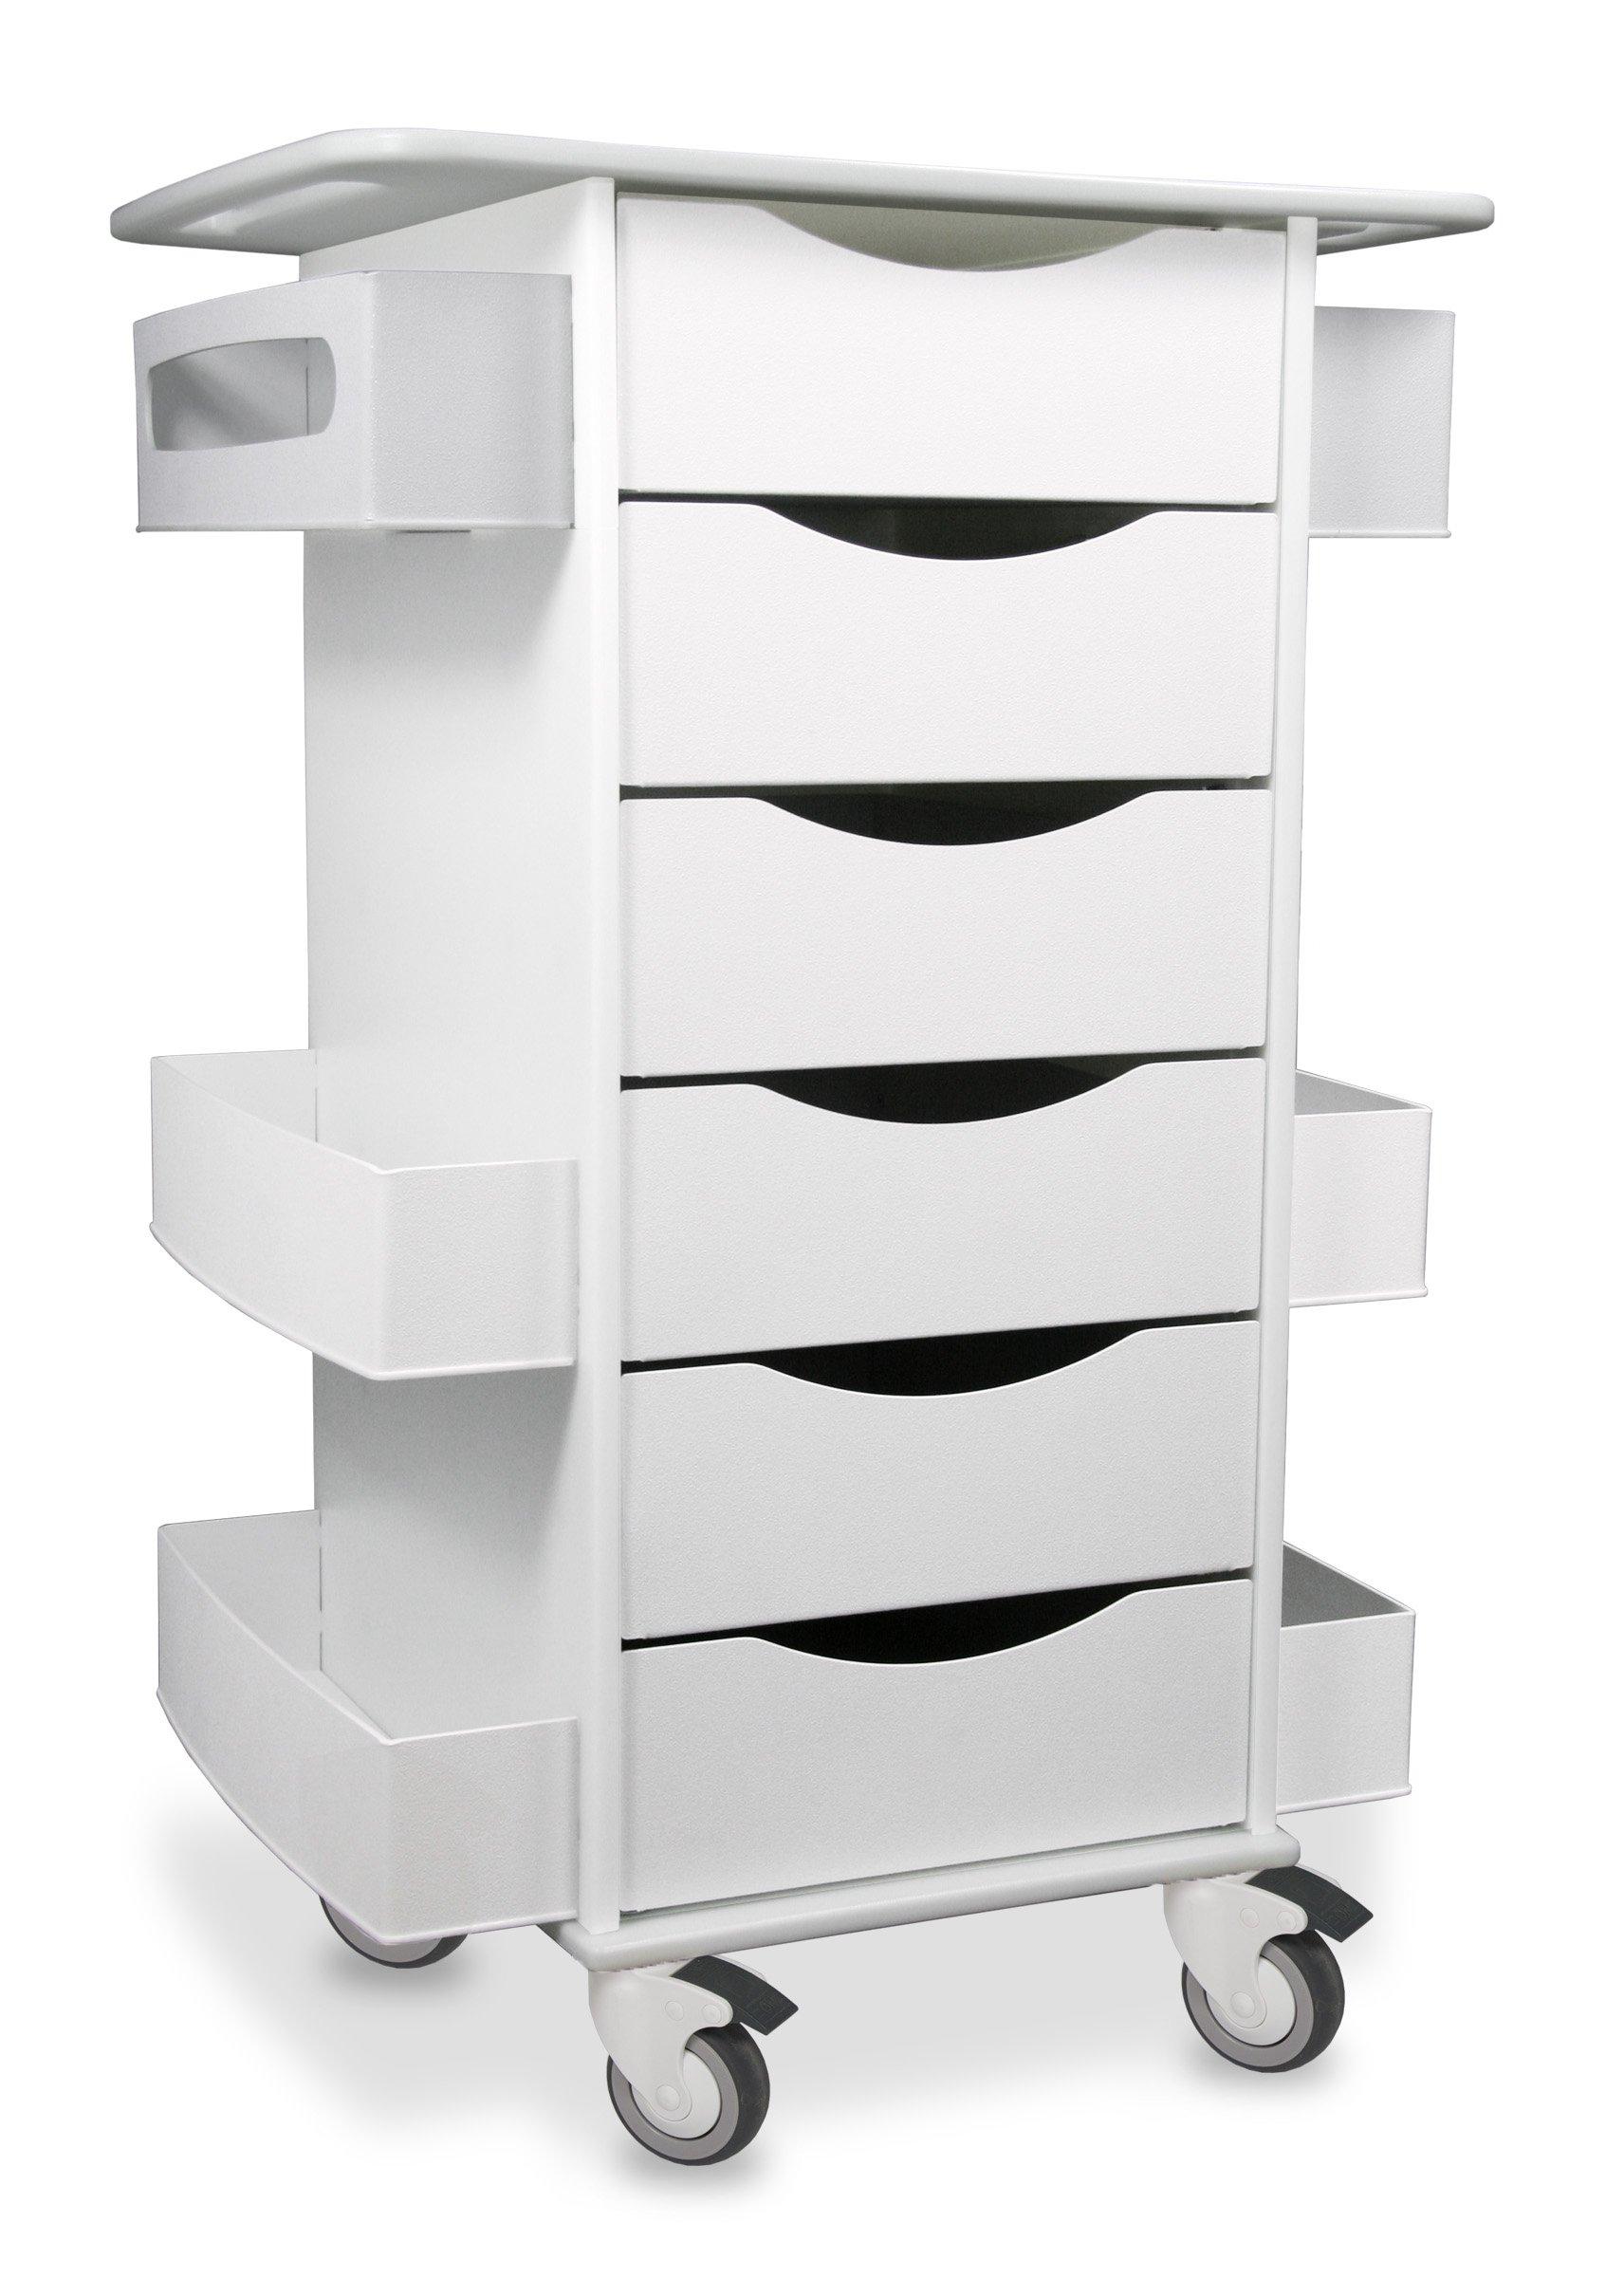 "TrippNT 51351 Core Six Drawer Cart, 23"" Width x 35"" Height x 19"" Depth, White"